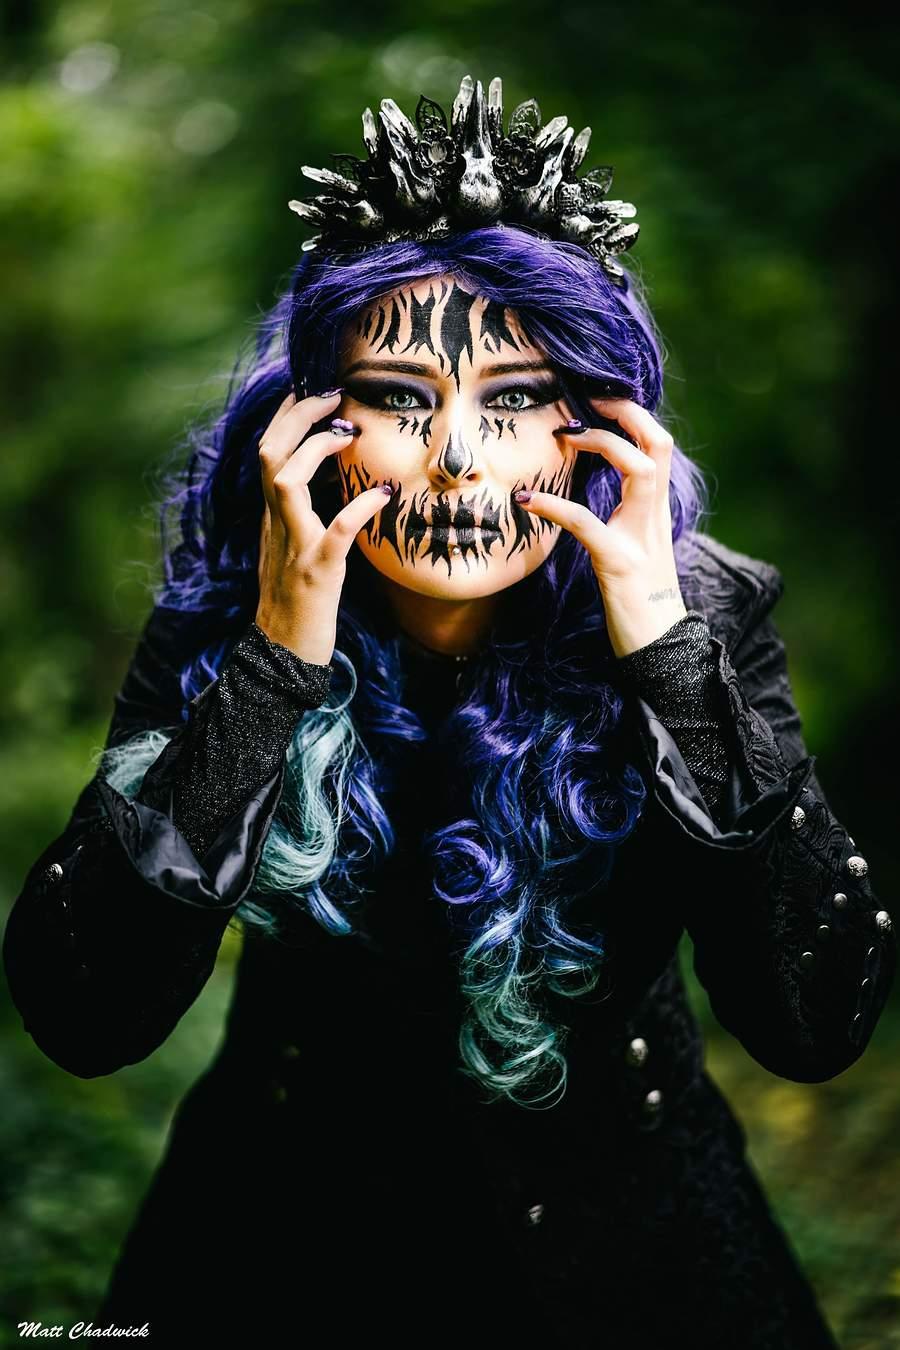 Photography by Matt Chadwick, Model Kelly Austin, Makeup by Kelly Austin Mua / Uploaded 14th October 2019 @ 10:33 PM